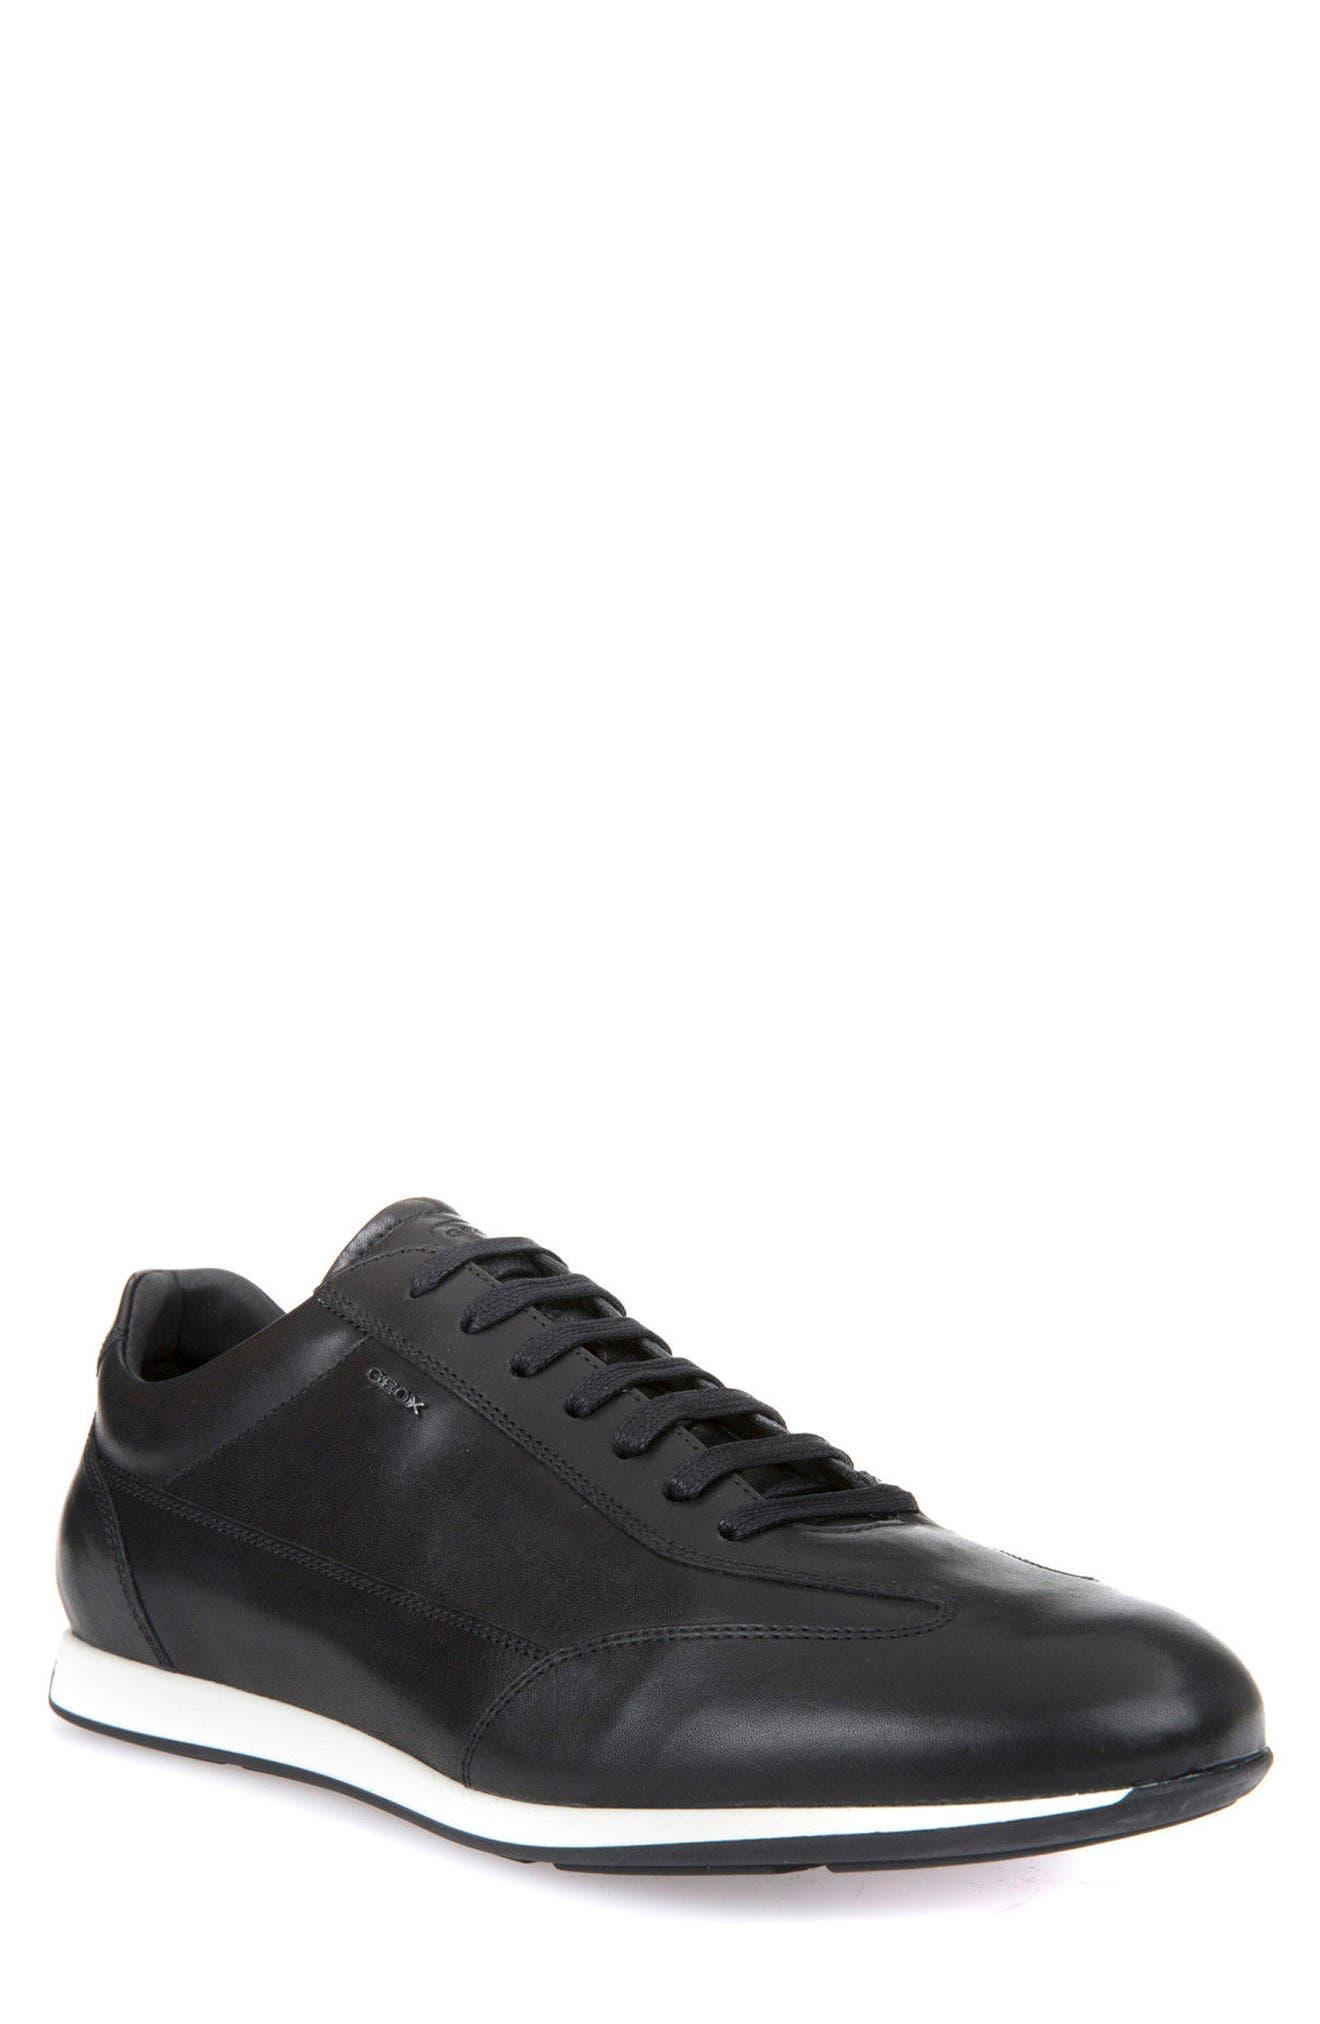 Clemet 1 Sneaker,                             Main thumbnail 1, color,                             001